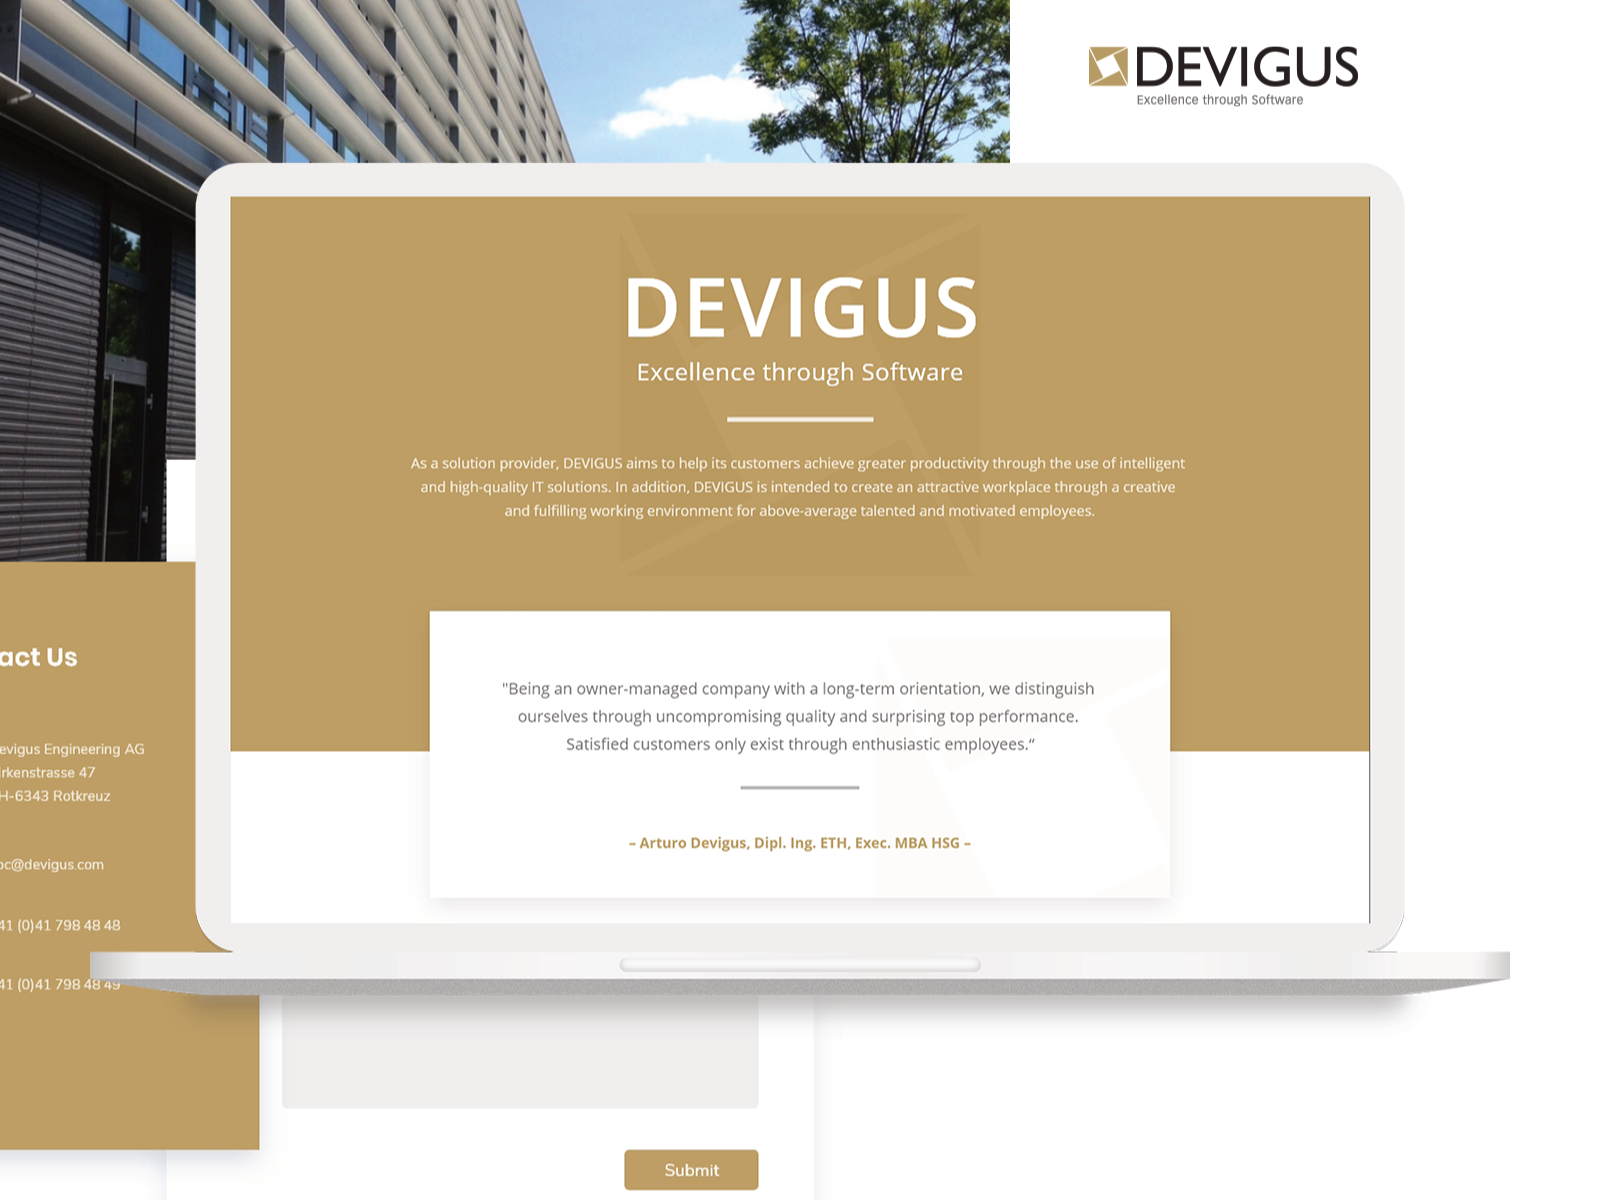 Devigus Web Design By Rozzaq On Dribbble